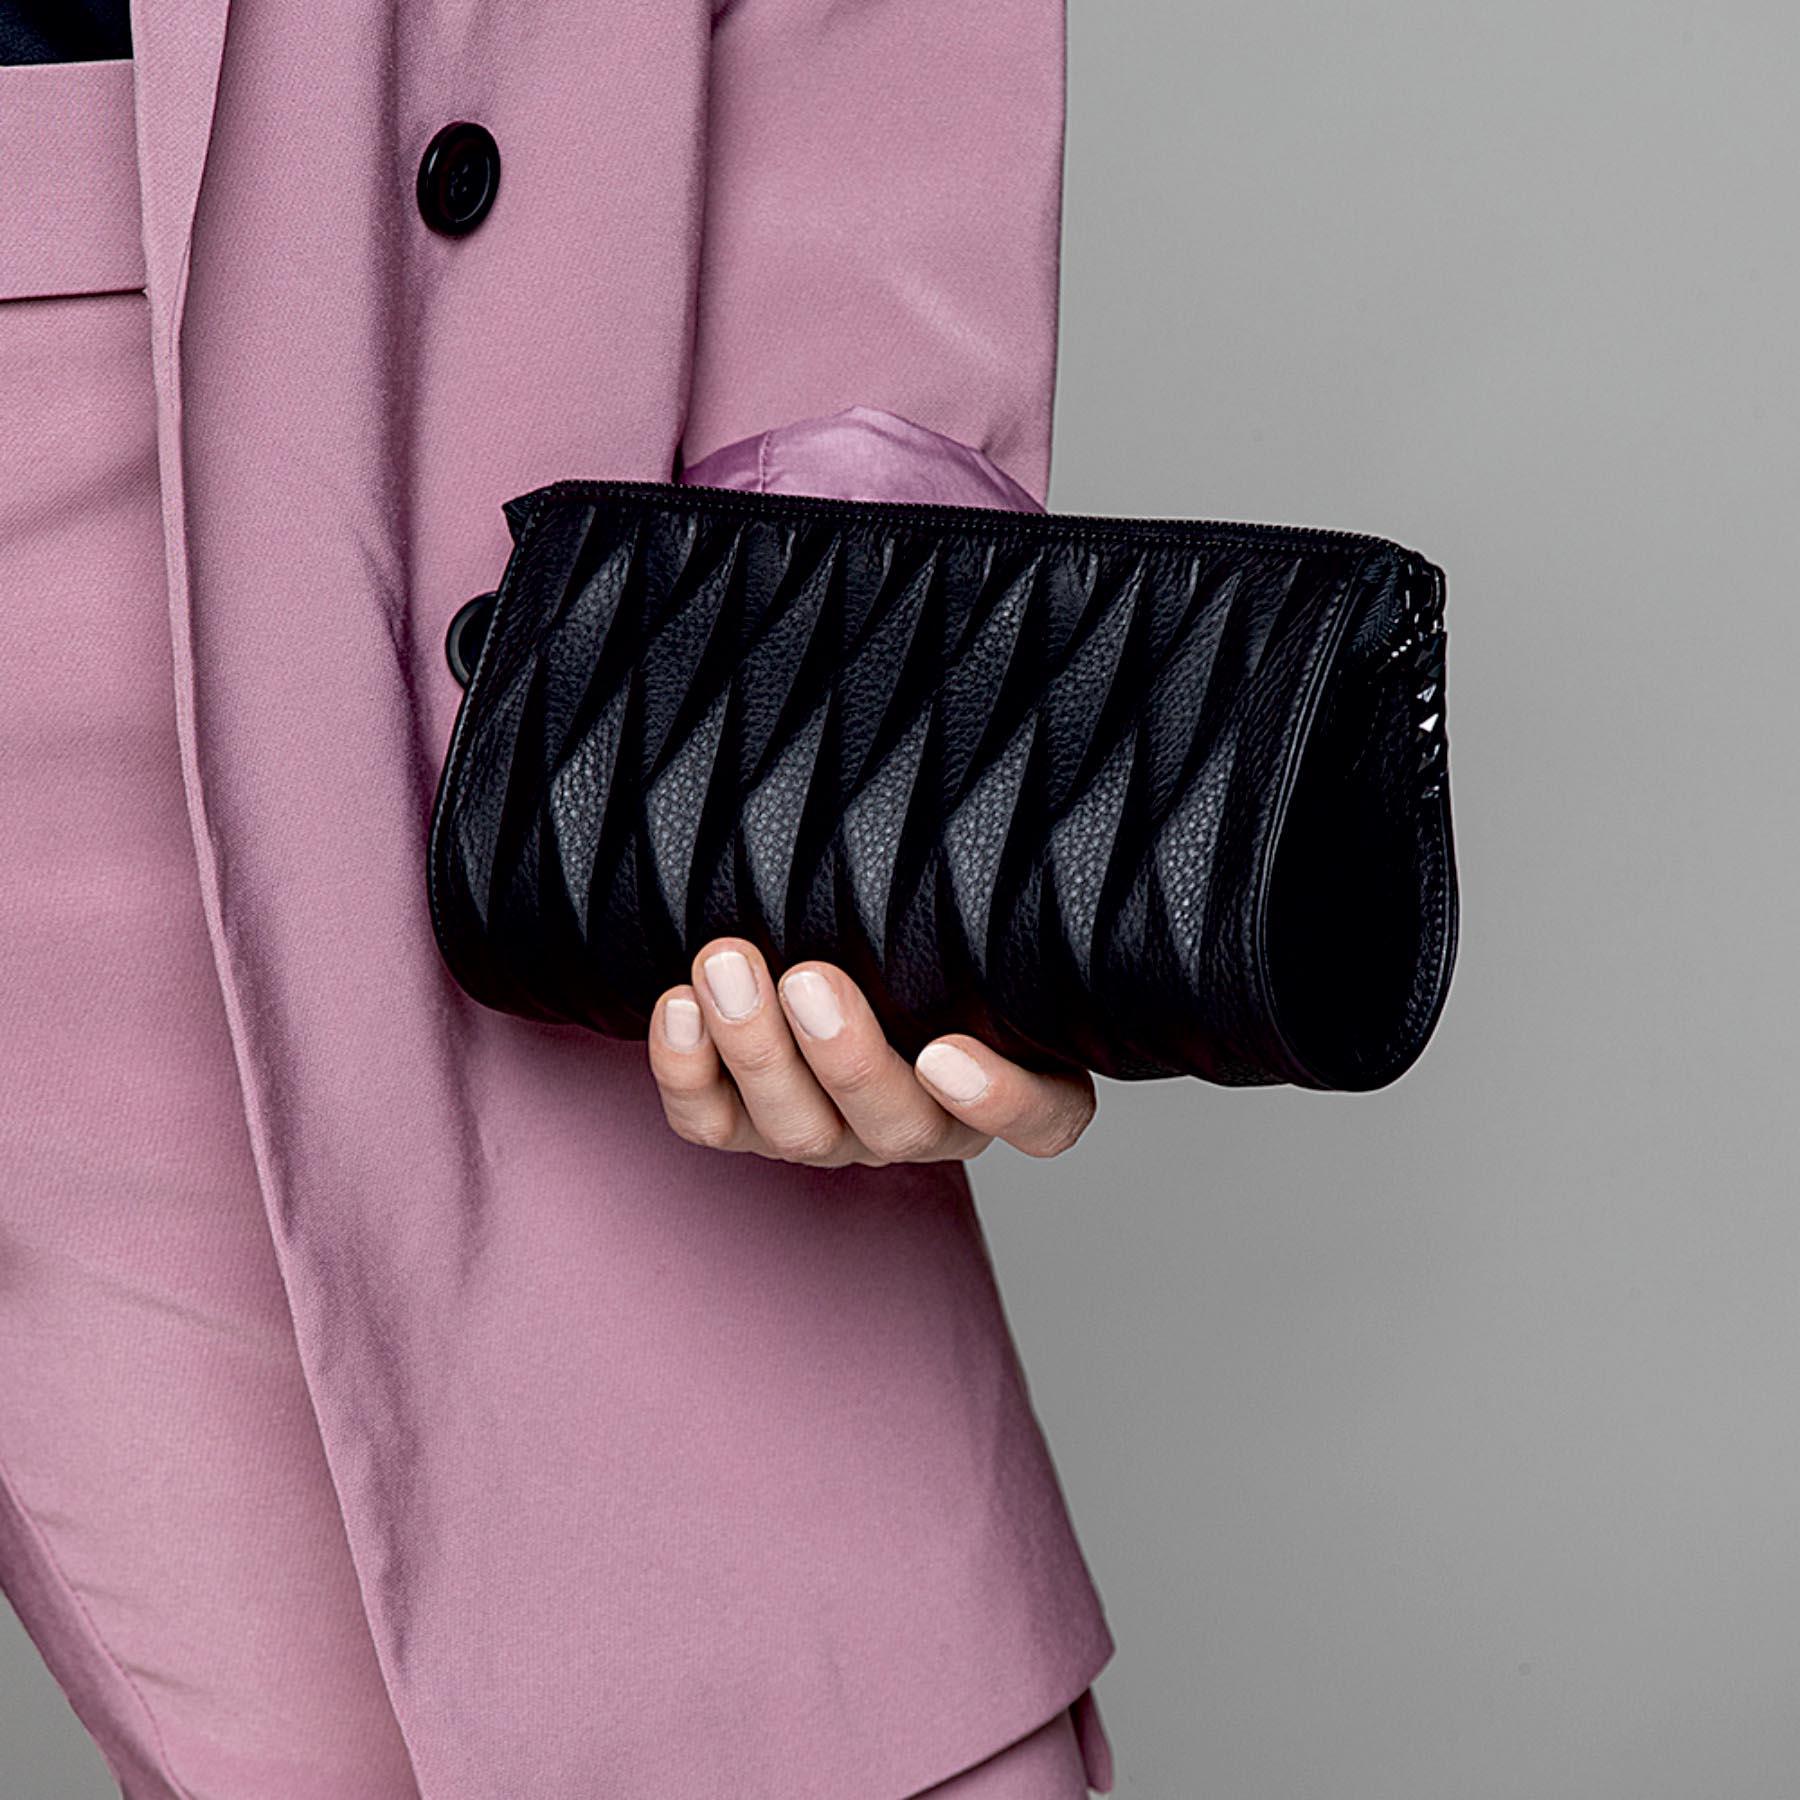 Tokyo Clutch Bag by Imme Vogel